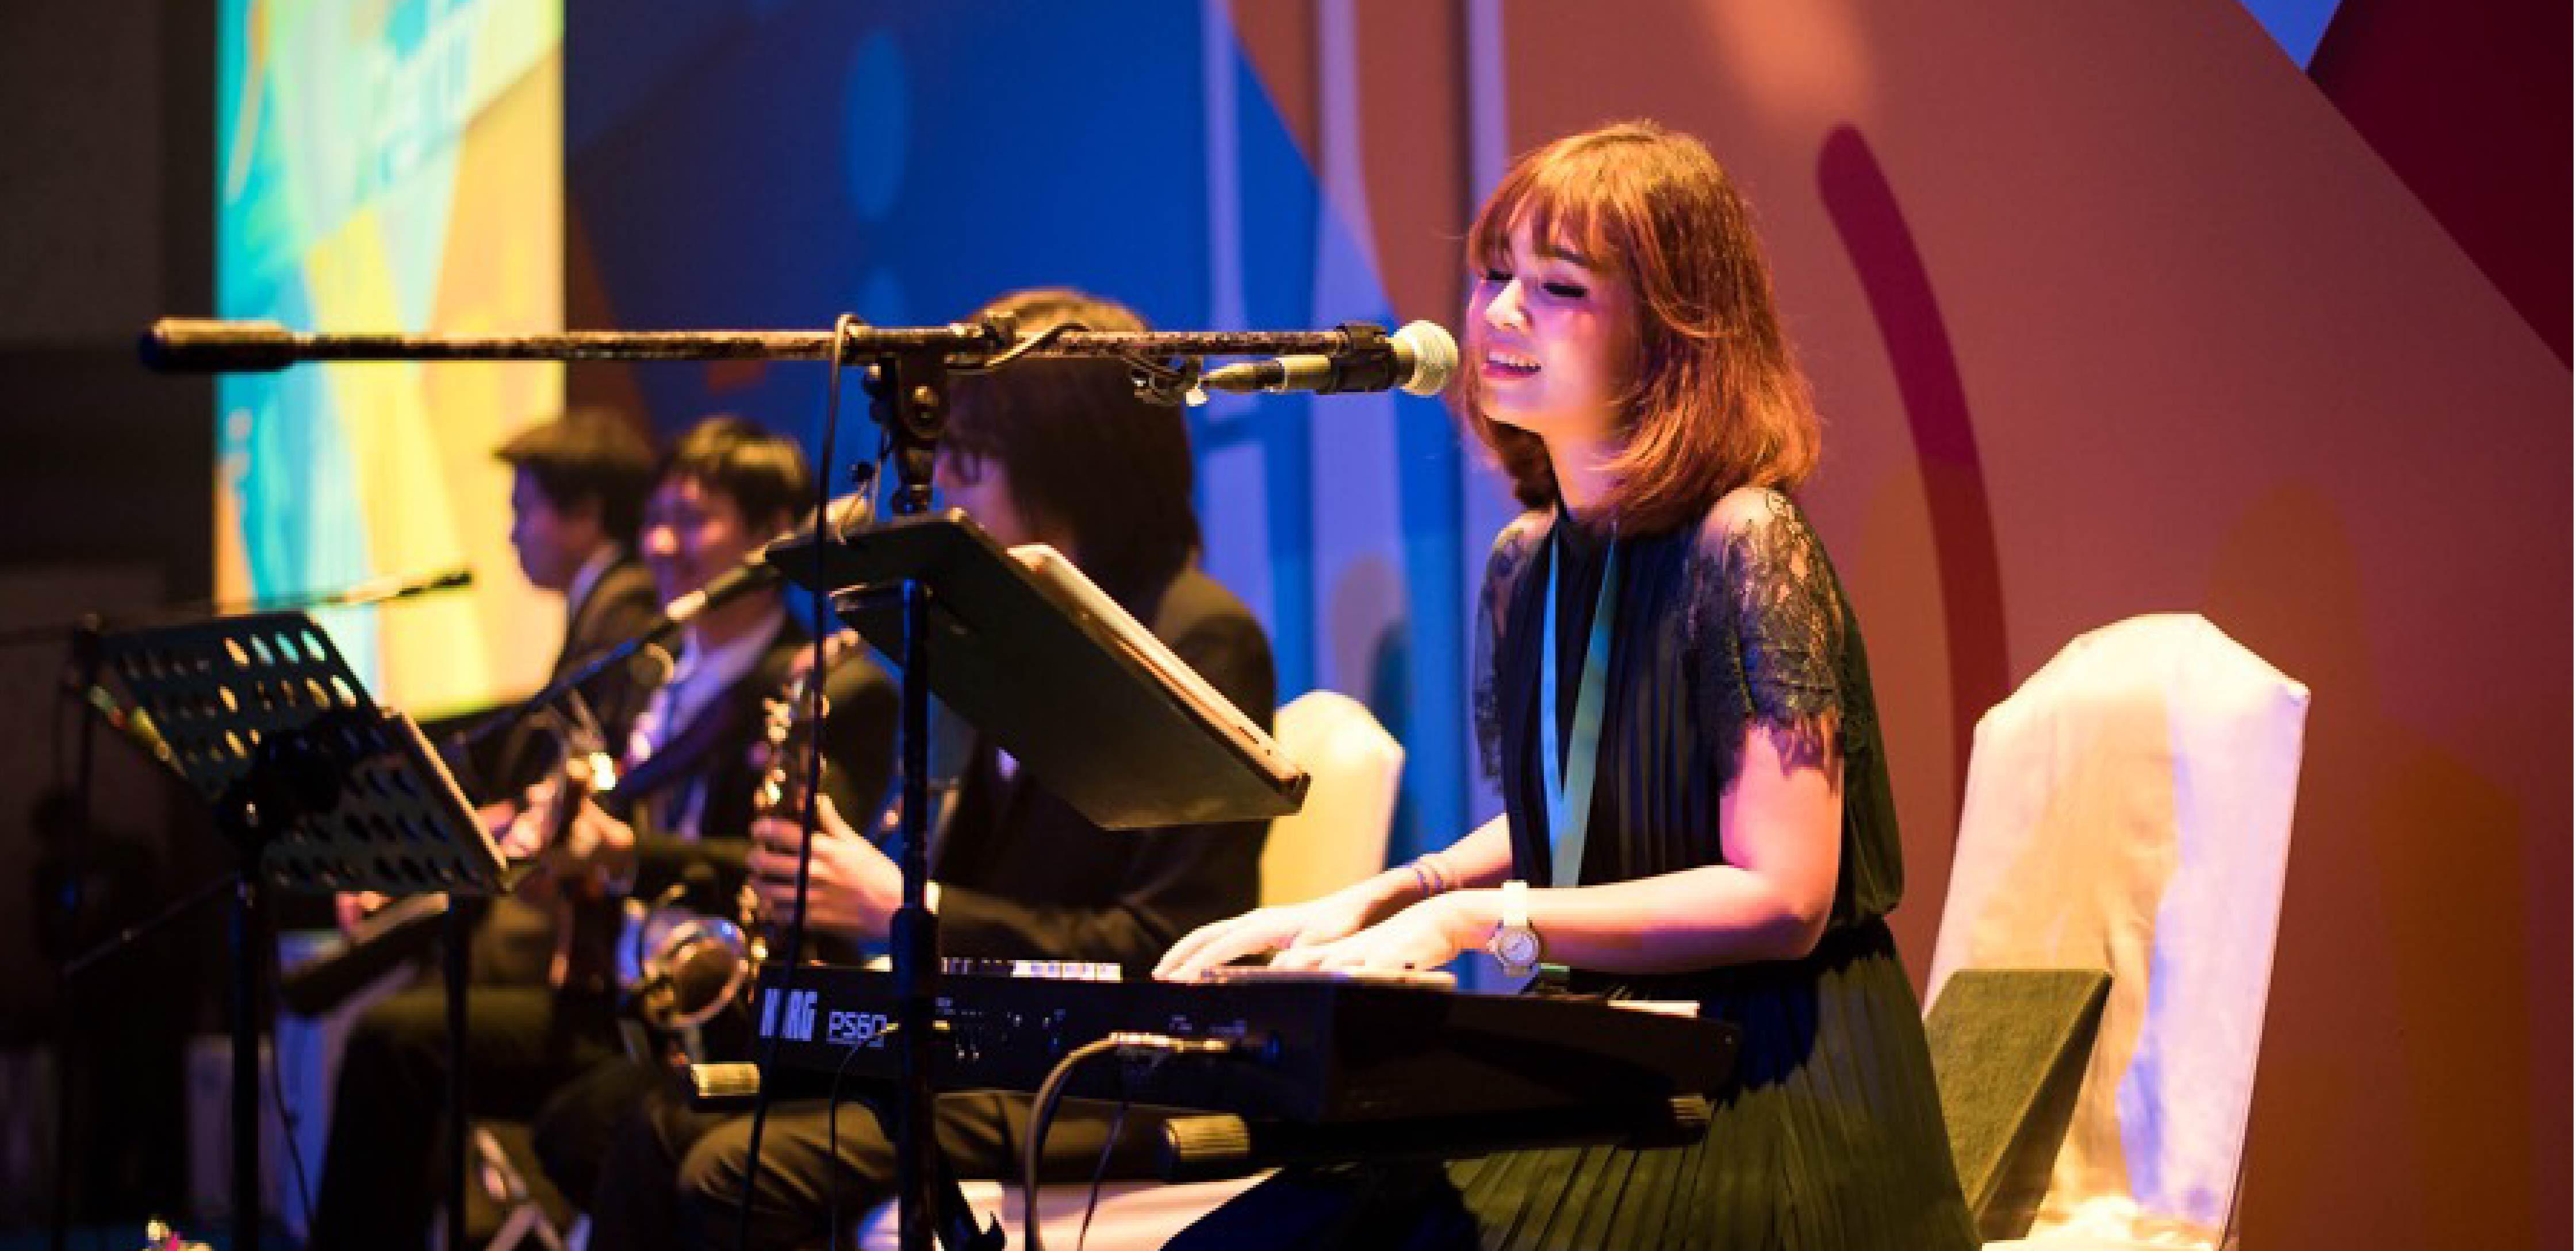 Quatzilla Band วงดนตรีงานปาร์ตี้ บริษัท เเมกซิไมซ์ เเมเนจเมนท์ จำกัด